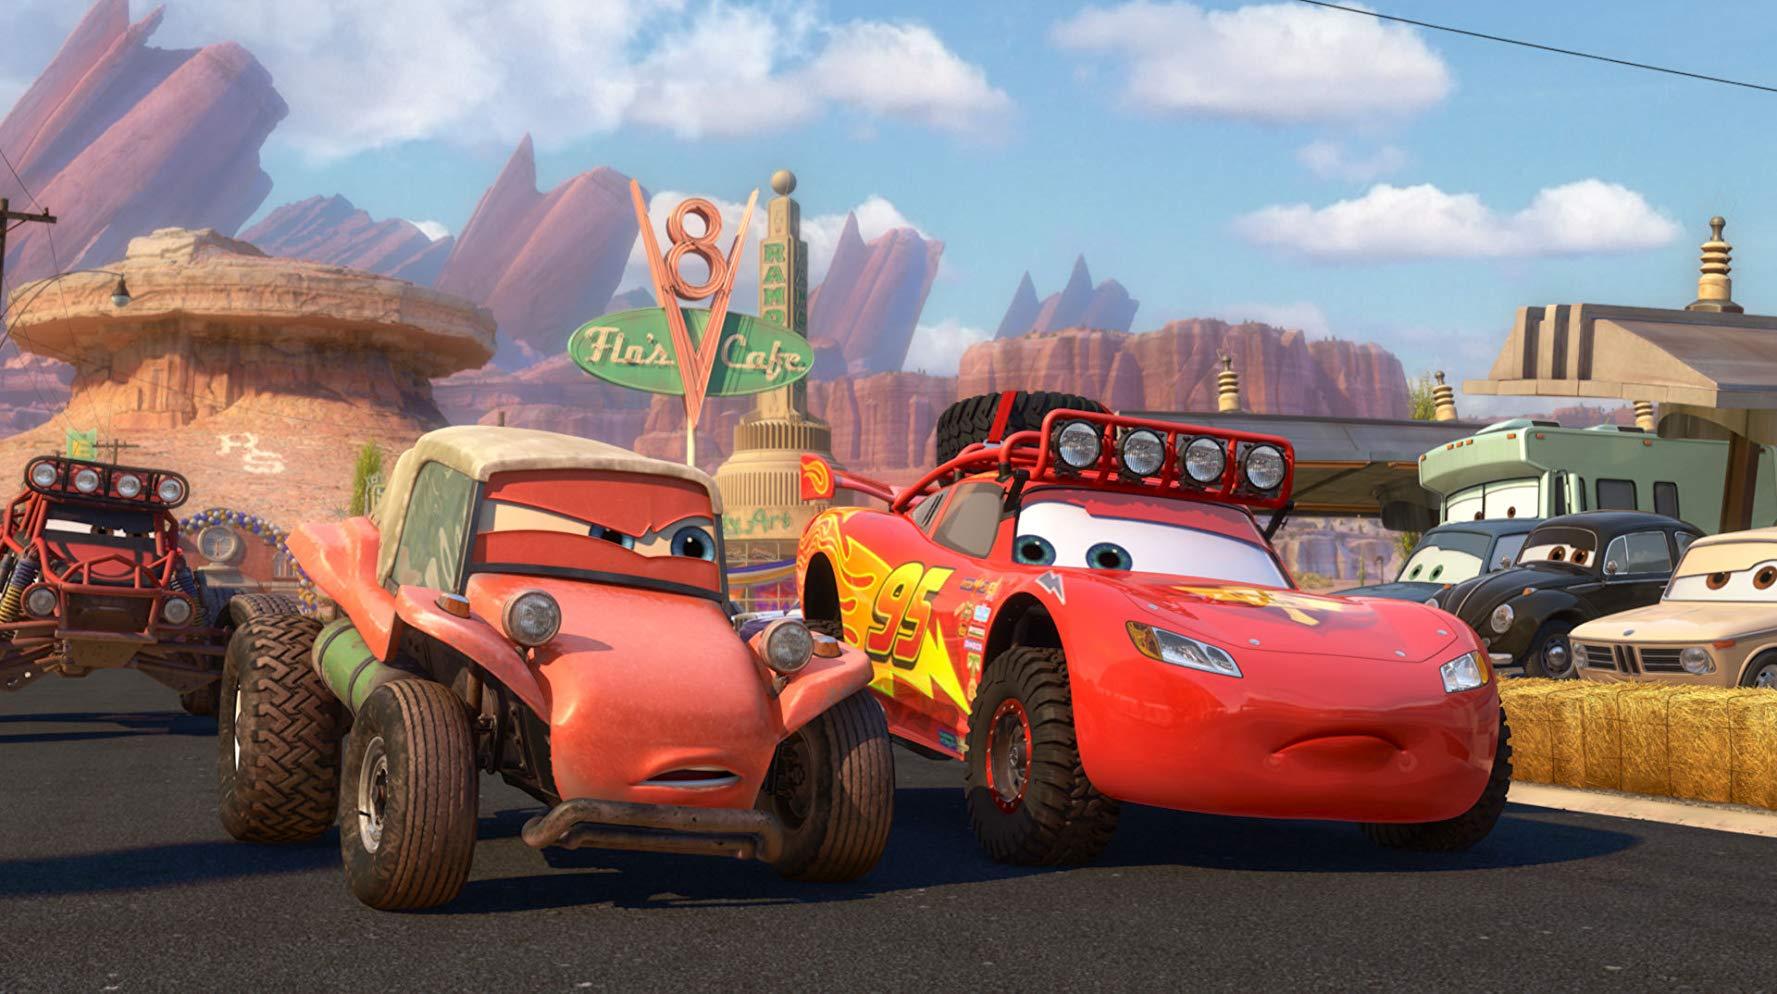 download The.Radiator.Springs.500.5.2013.1080p.BluRay.x264-RedBlade